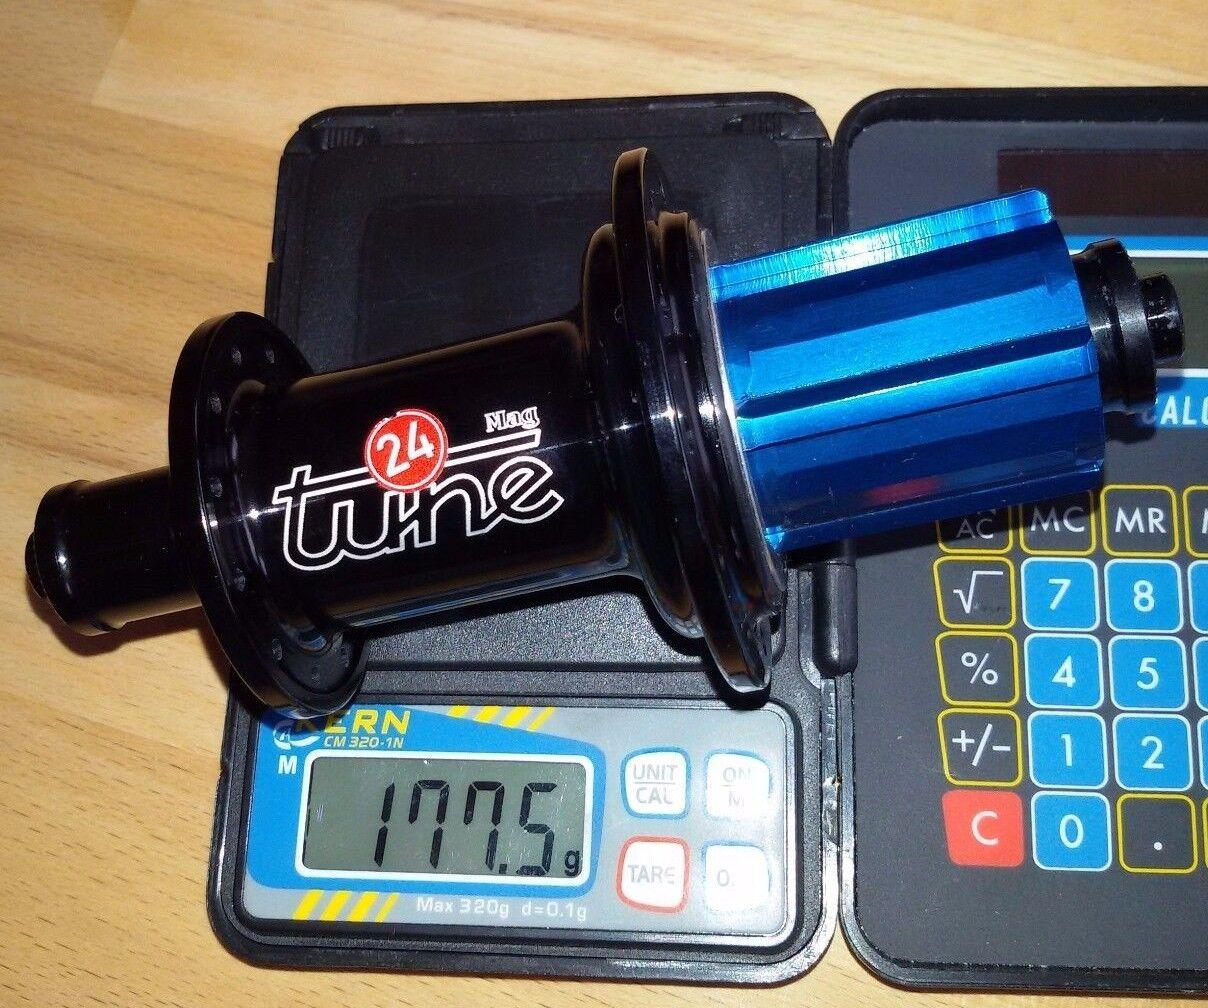 Tune Mig 70  FRONT WHEEL HUB MAG 170 Rear Wheel Hub Hub Set 24 28 32 Campagnolo  looking for sales agent